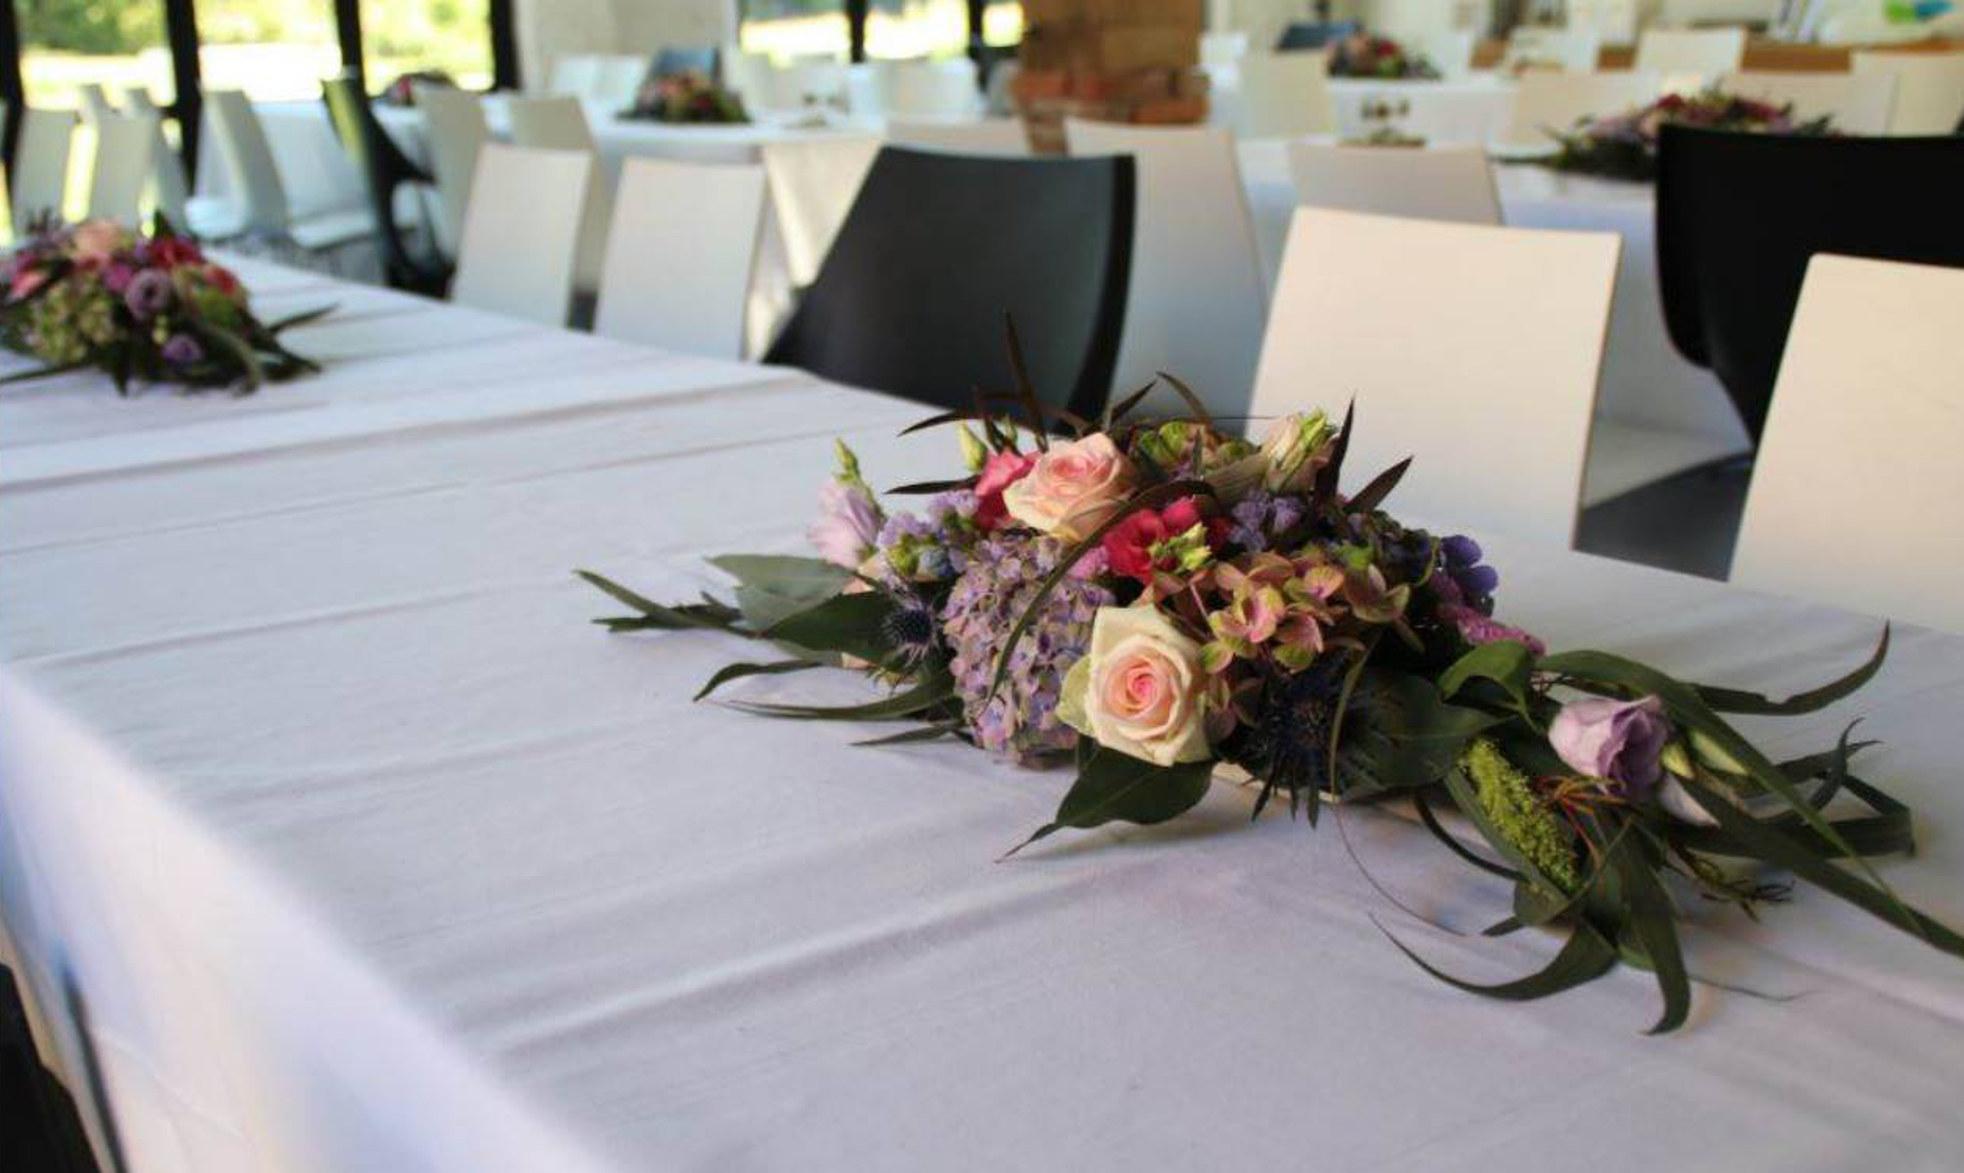 bloemen viooltje_scaled